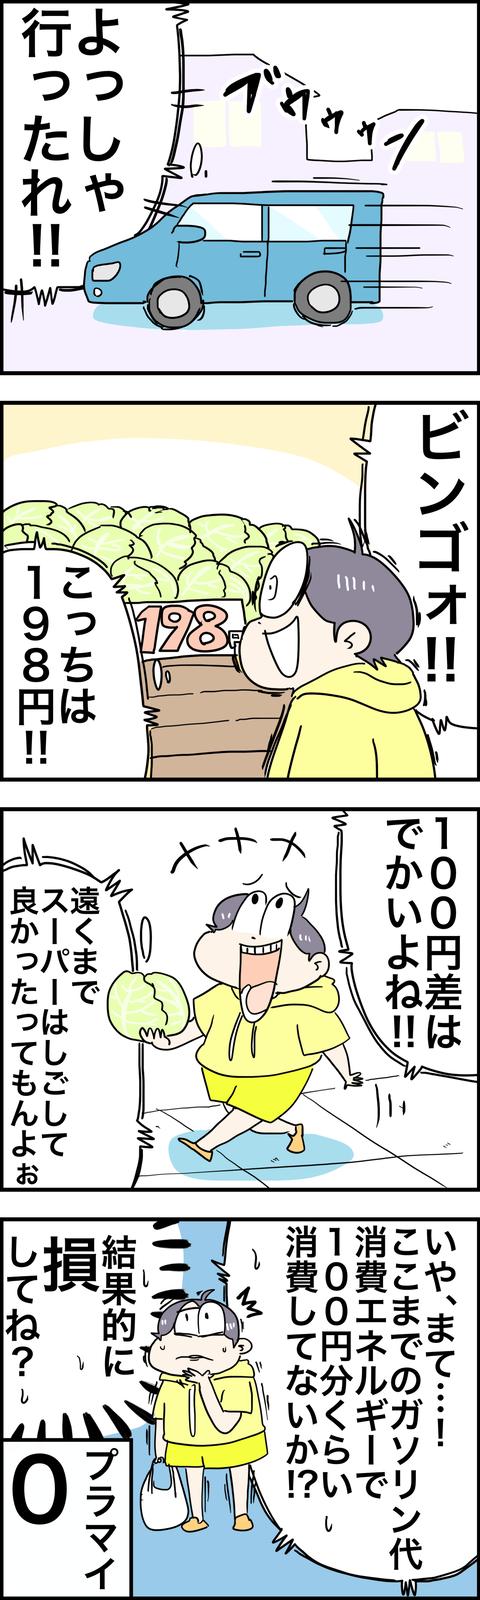 59FF8372-7A0C-4F3D-A44F-BEE776AF9725